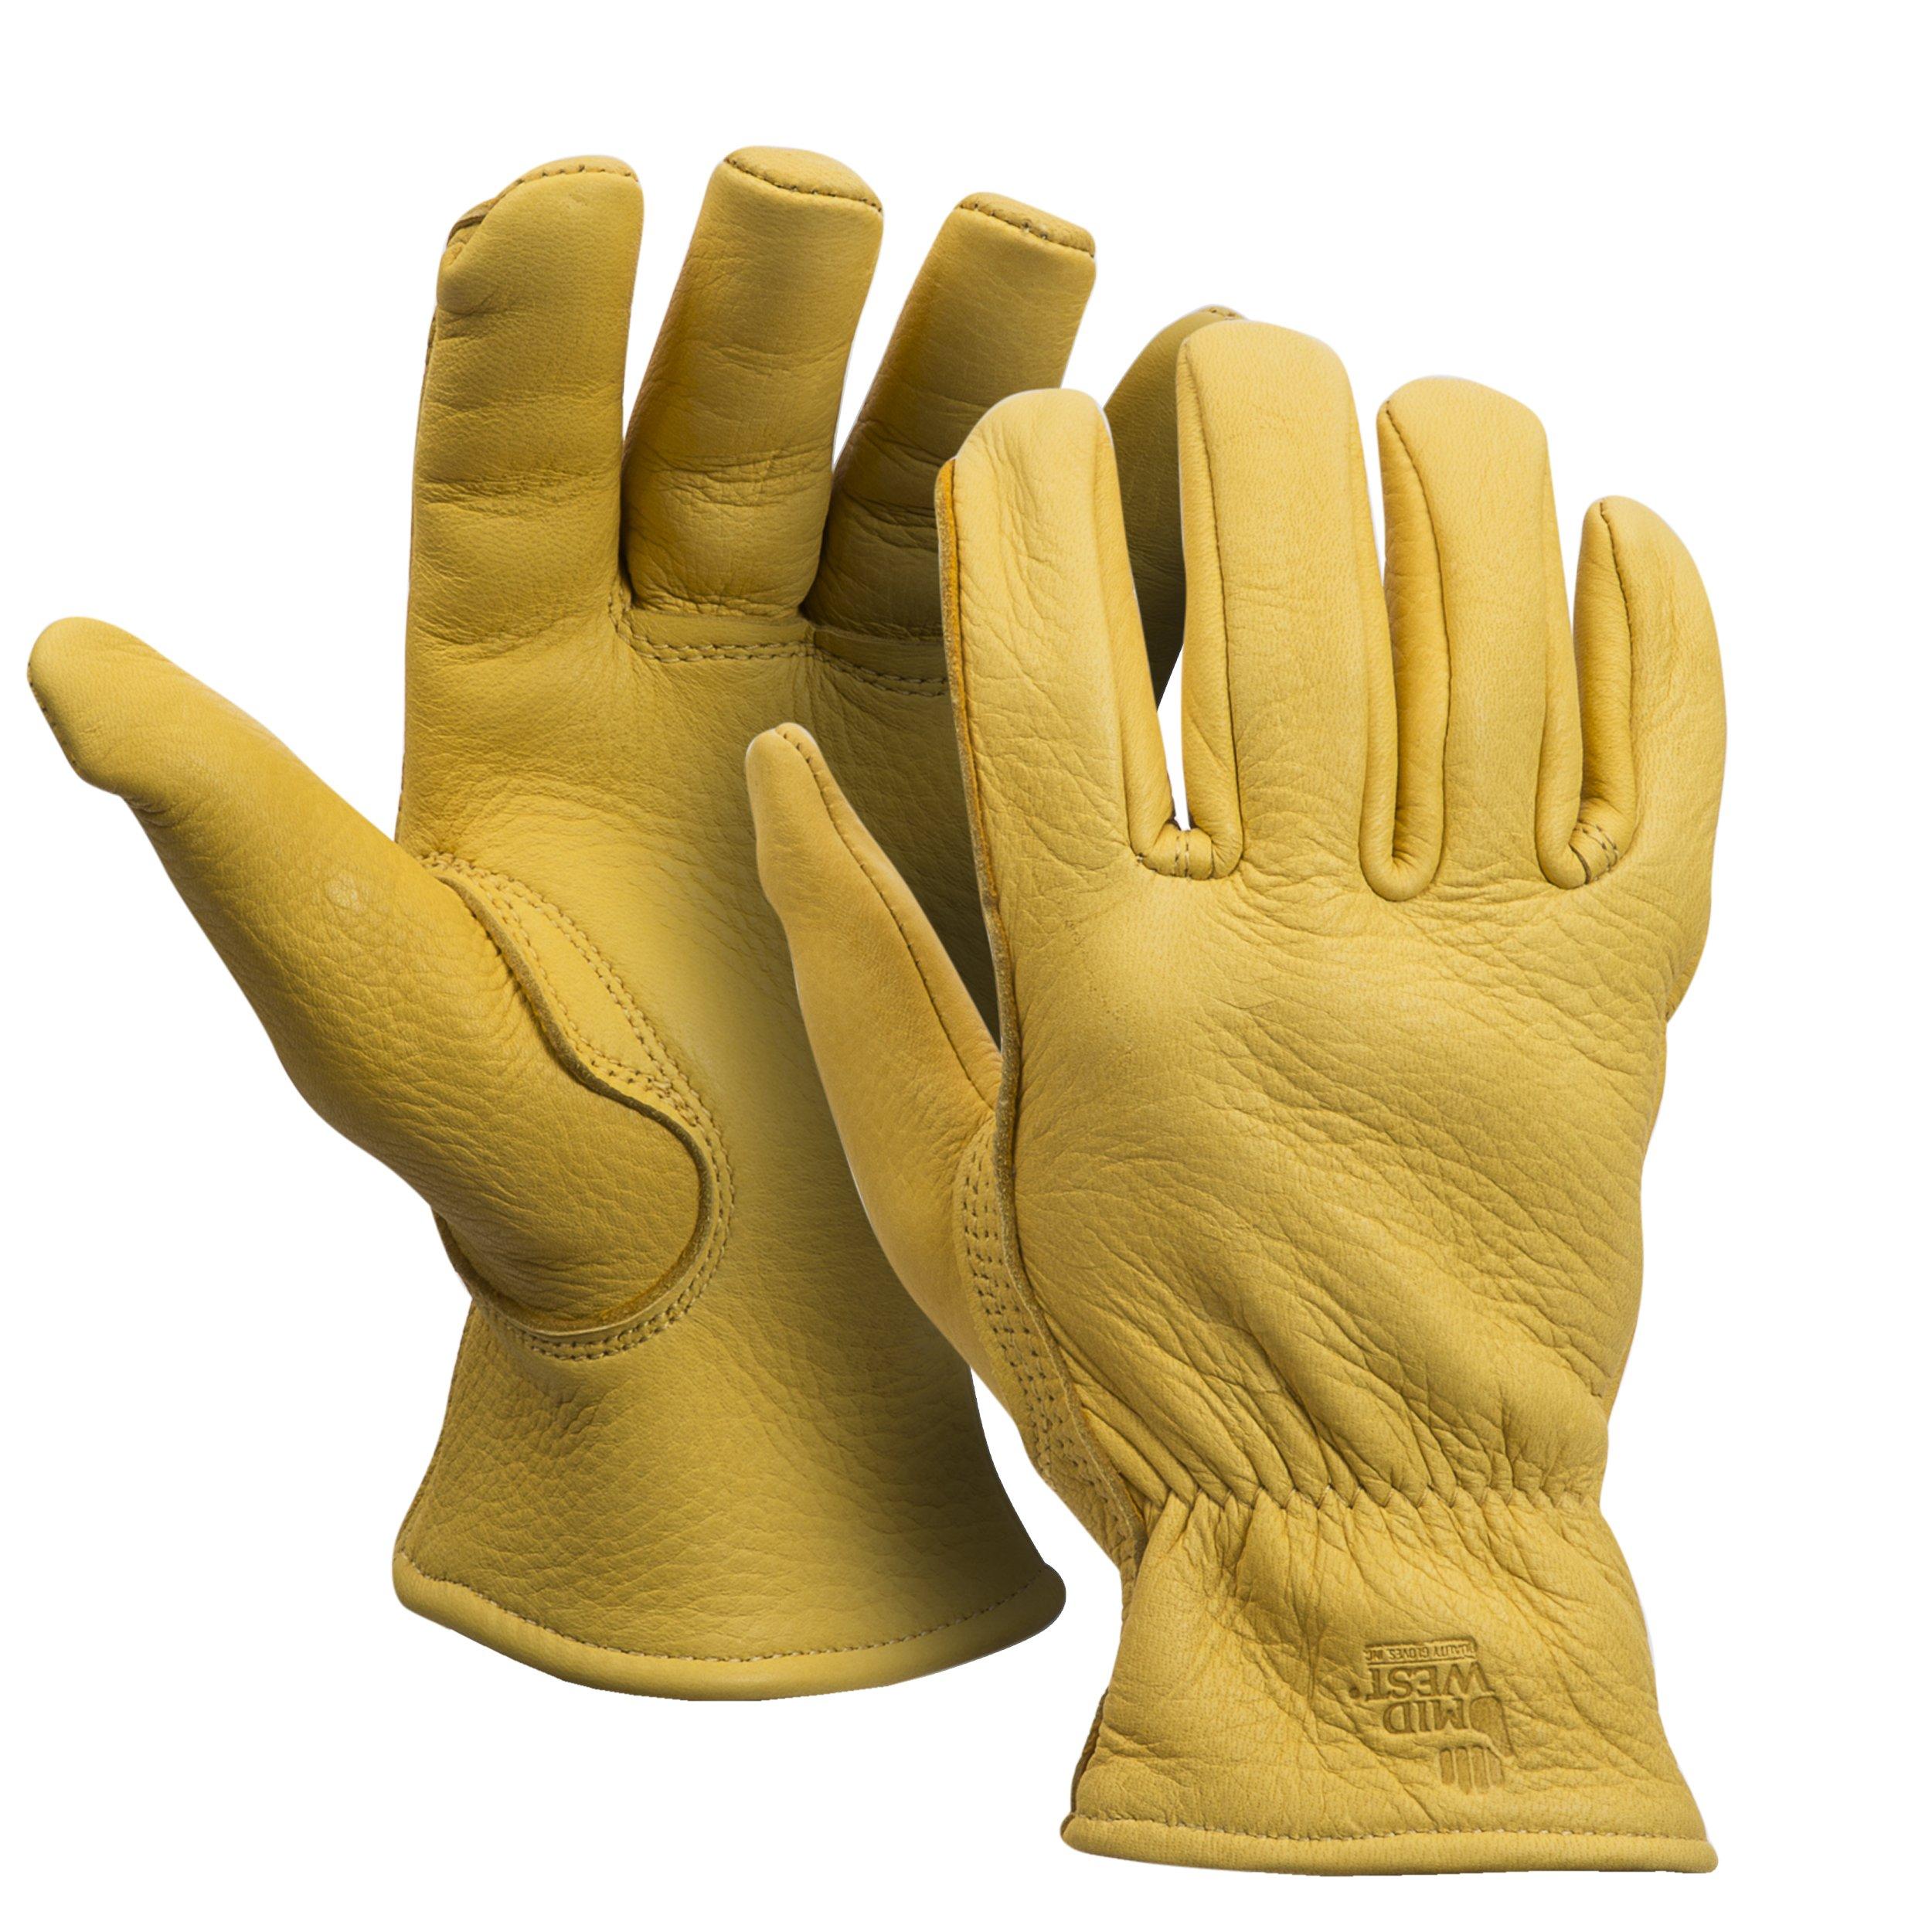 American Made Genuine Deerskin Buckskin Leather Work Gloves , 850, Size: Large by Midwest Gloves & Gear